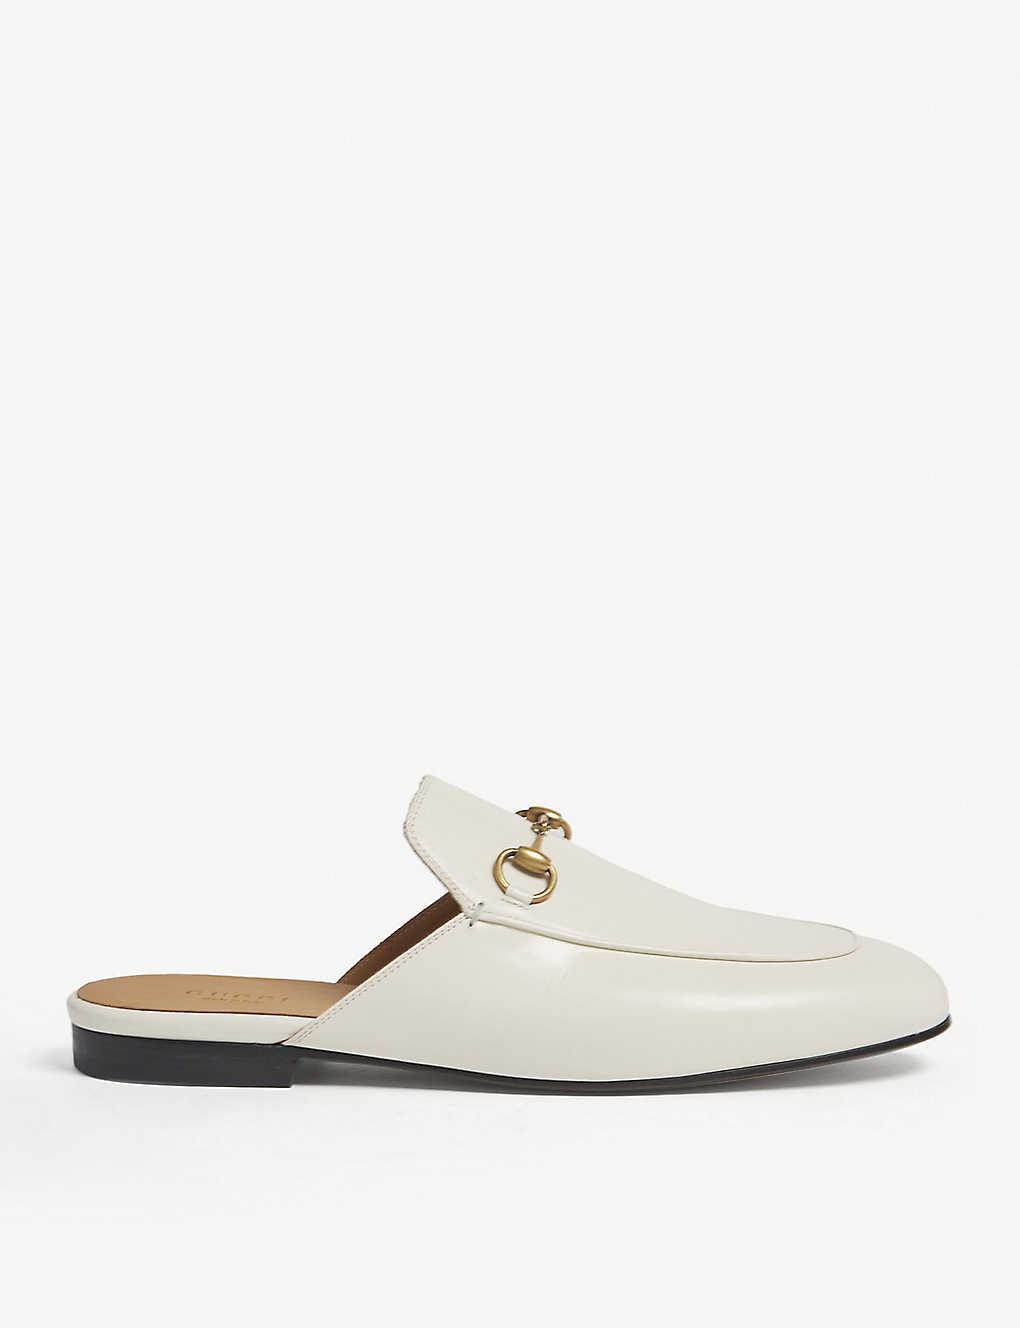 27bcba2e0 GUCCI - Princetown leather slippers | Selfridges.com